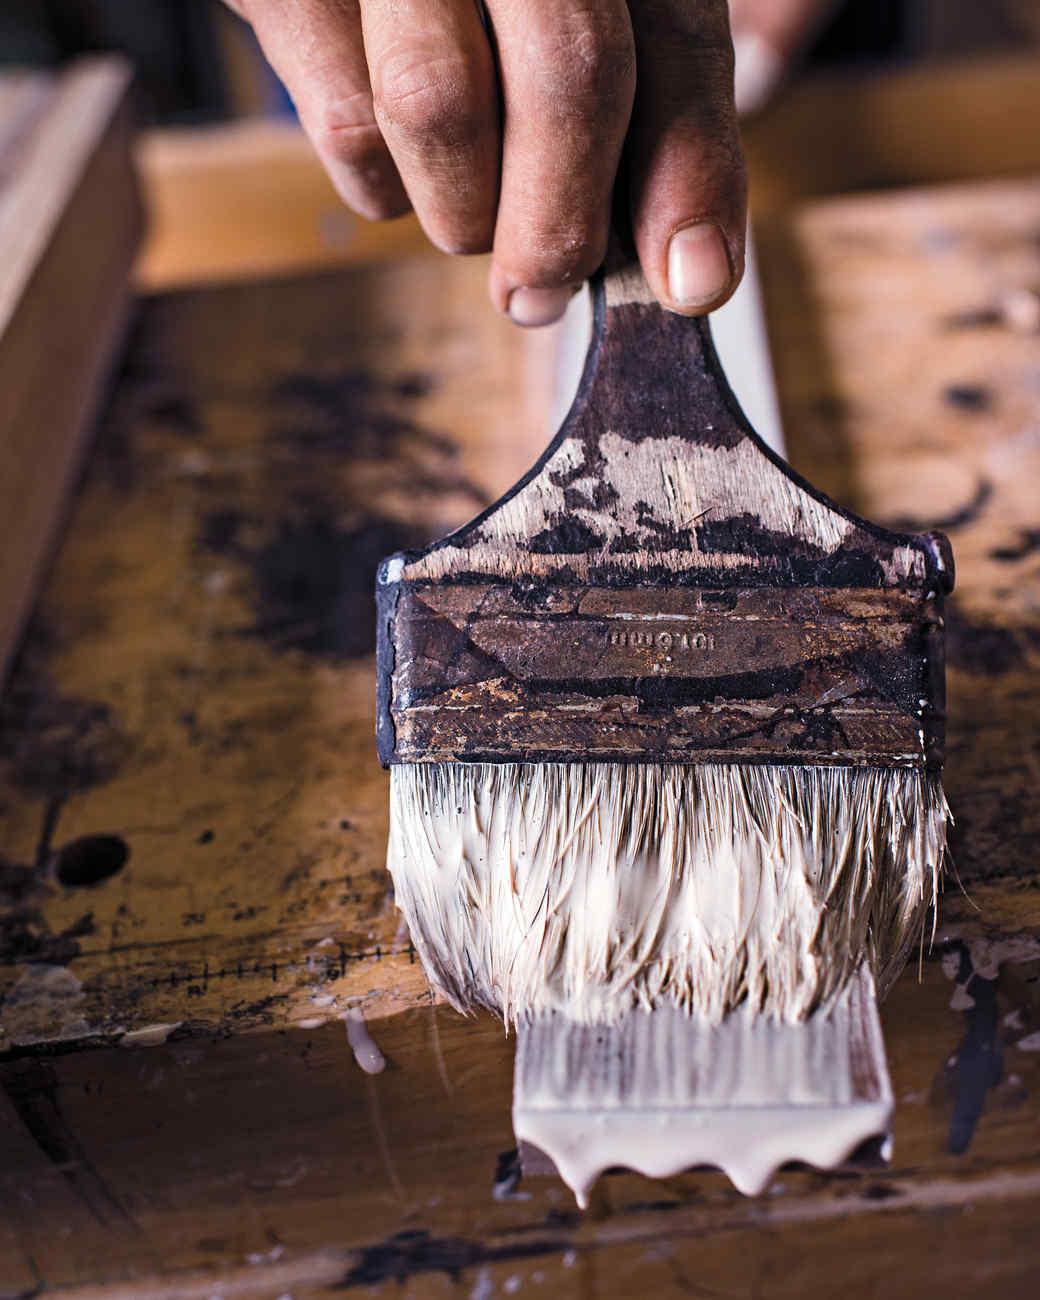 wooden-palate-316-mld110682.jpg